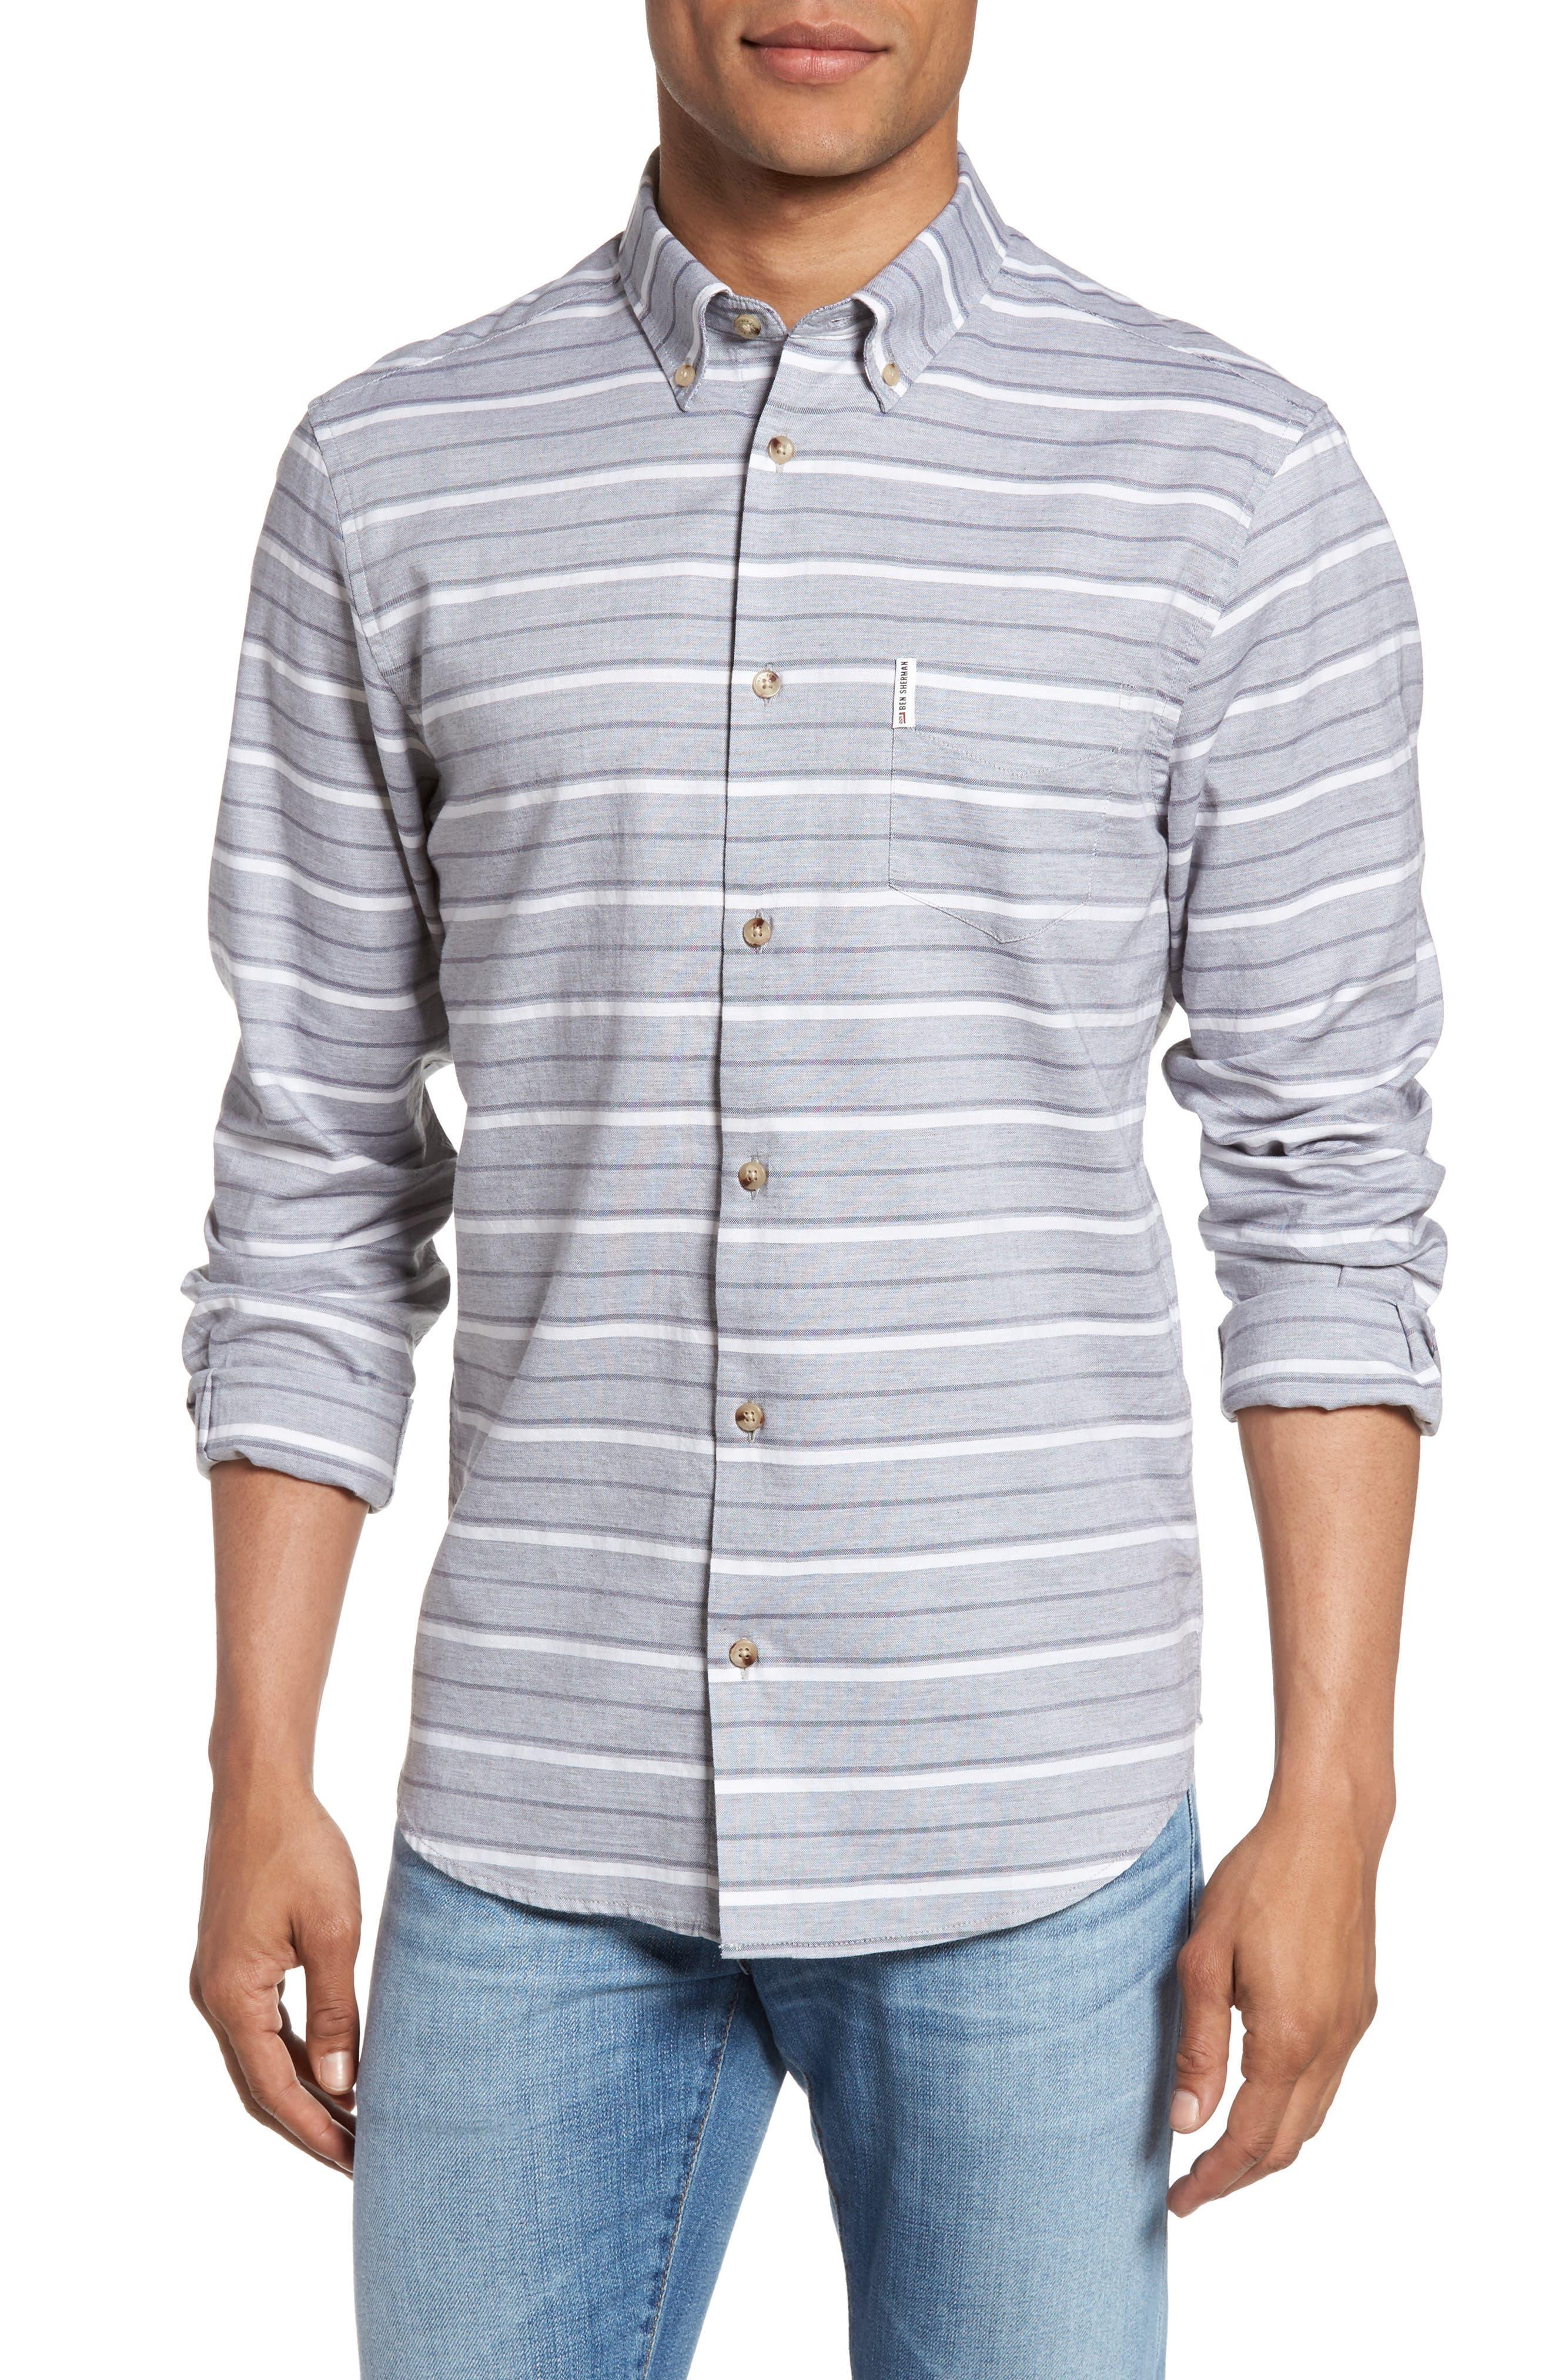 Tipping Horizontal Stripe Shirt,                             Main thumbnail 1, color,                             020